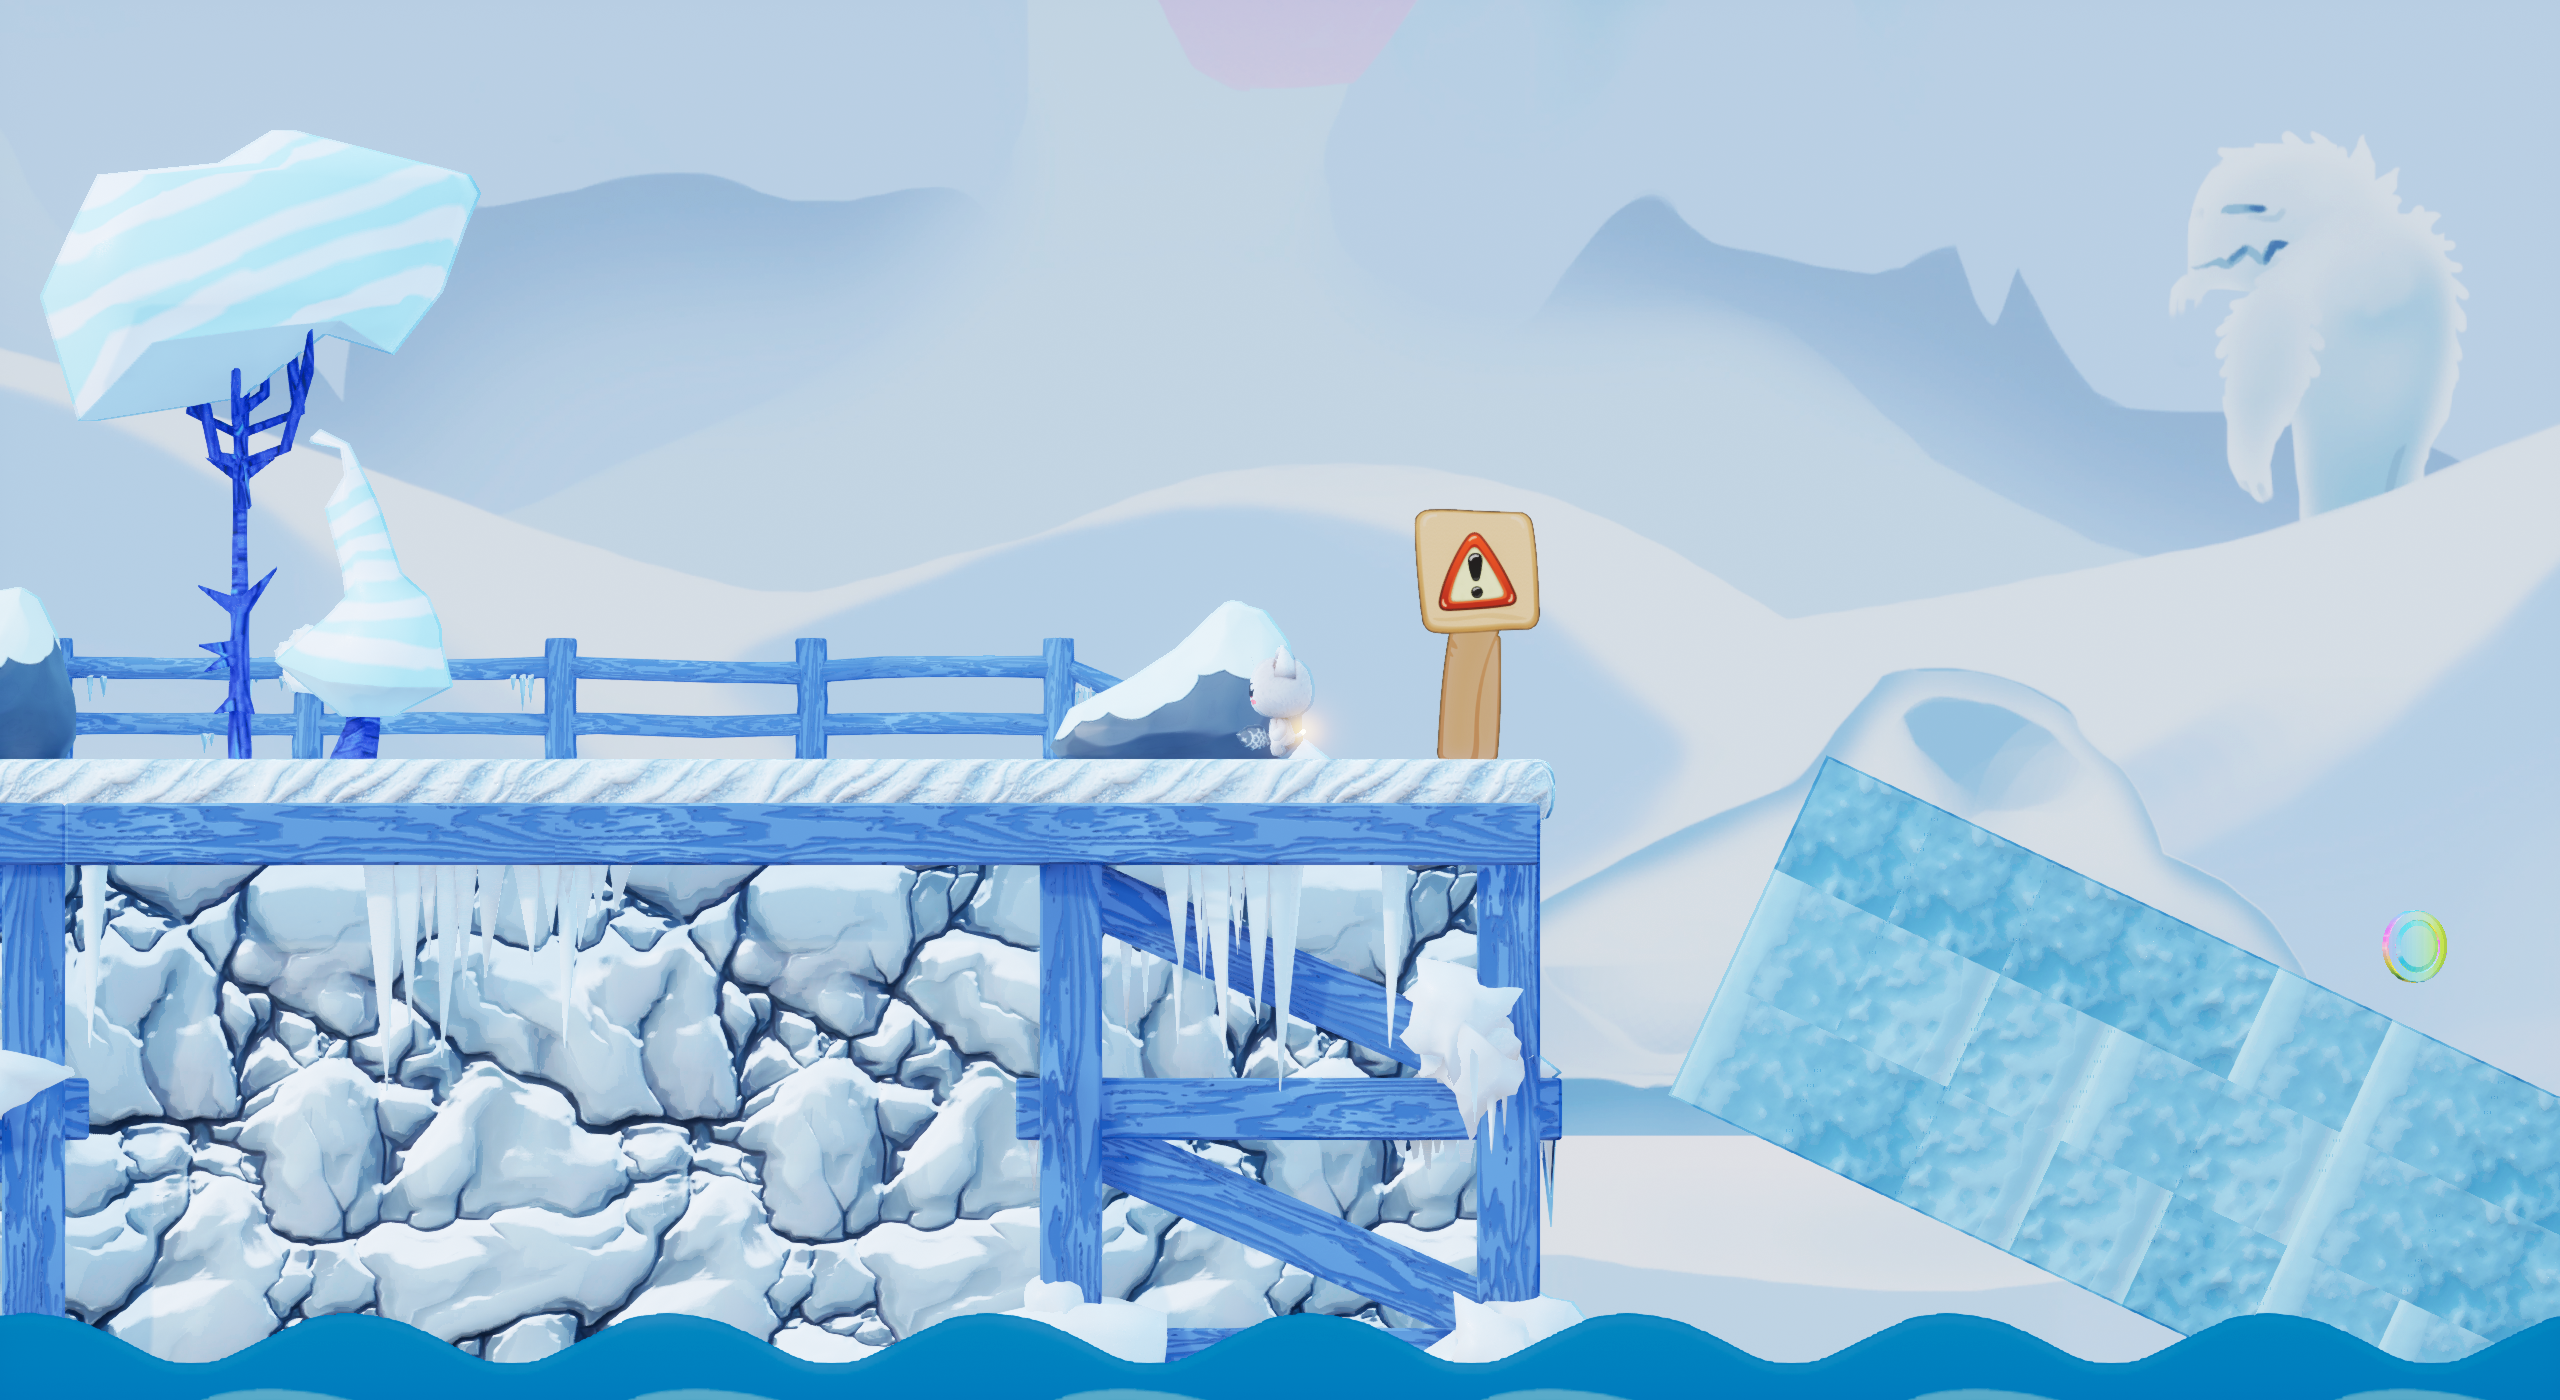 IceLevel02